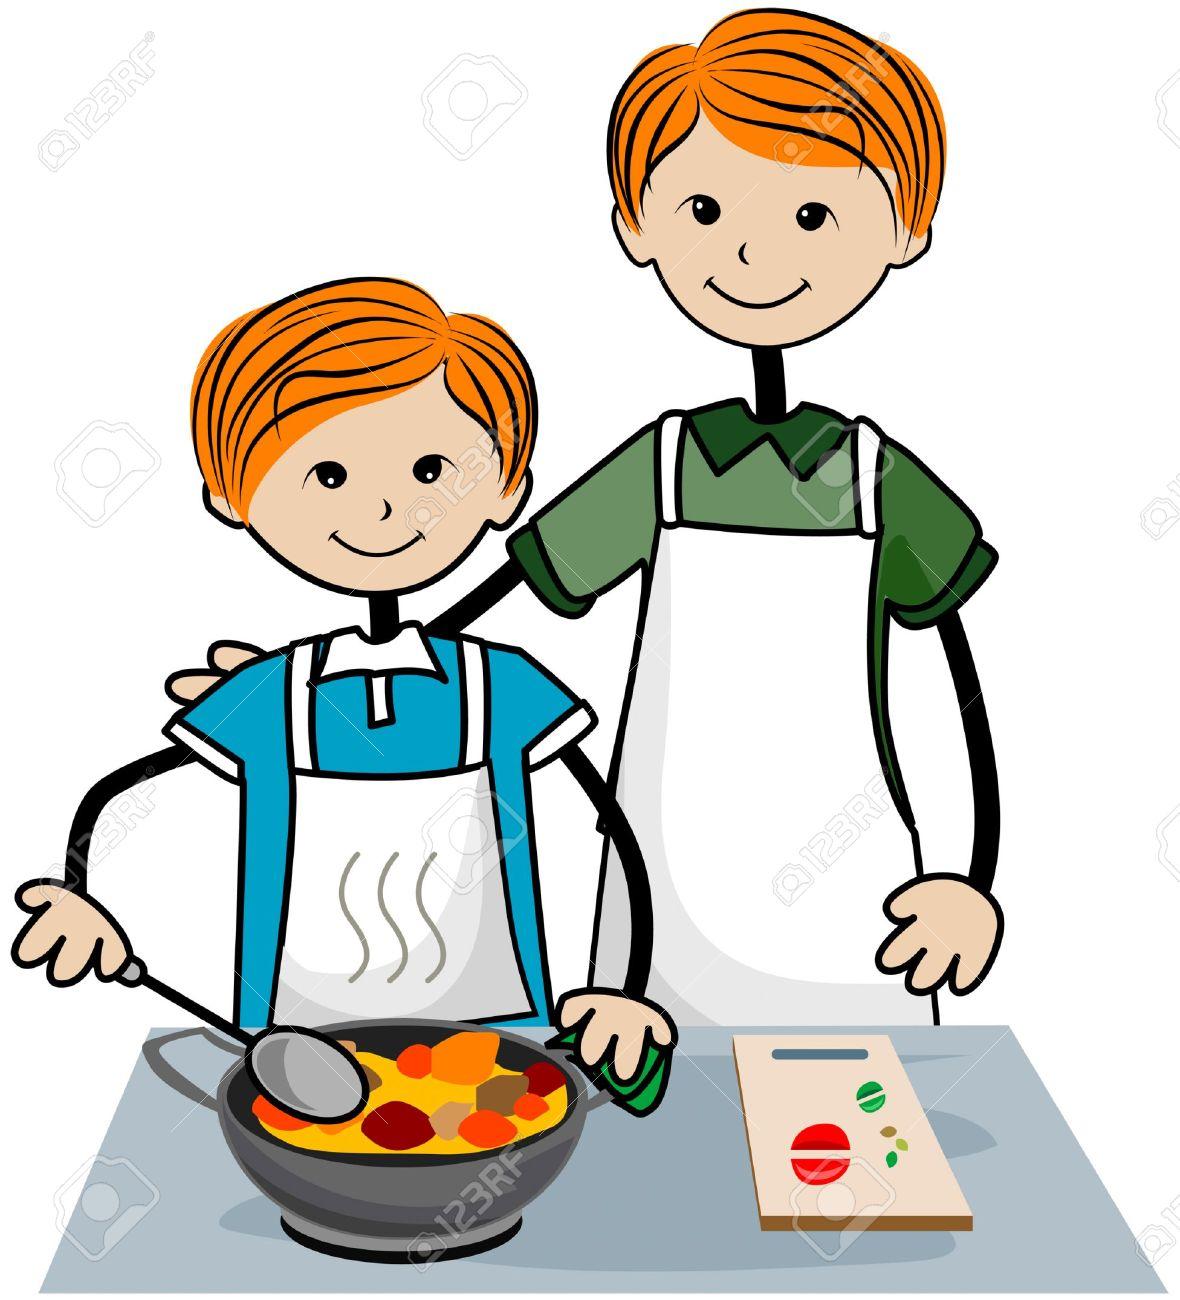 Boy clipart cooking Cooker cooker clipart Boy clipart